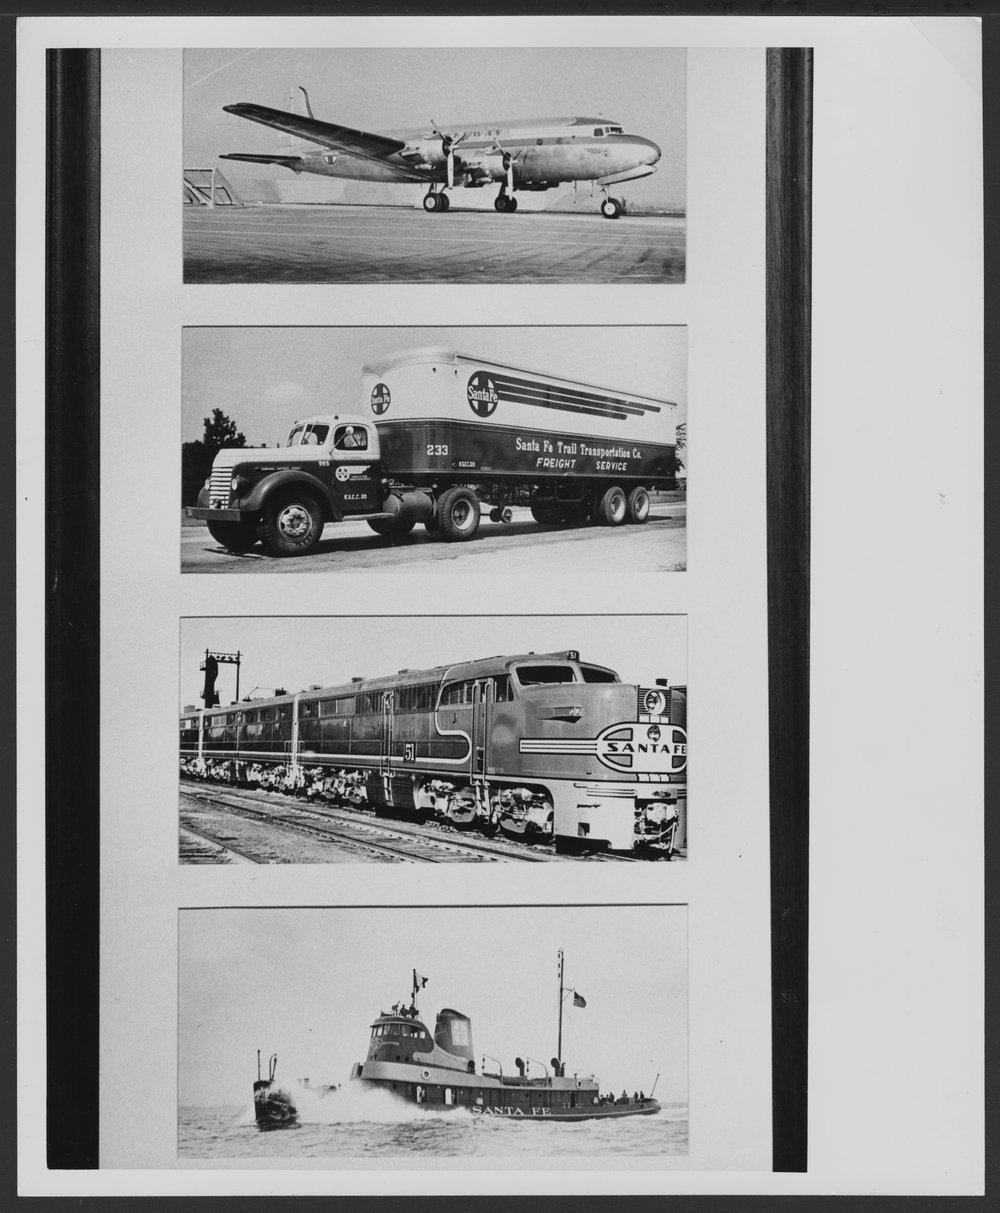 Atchison, Topeka & Santa Fe Railway Company's freight operations